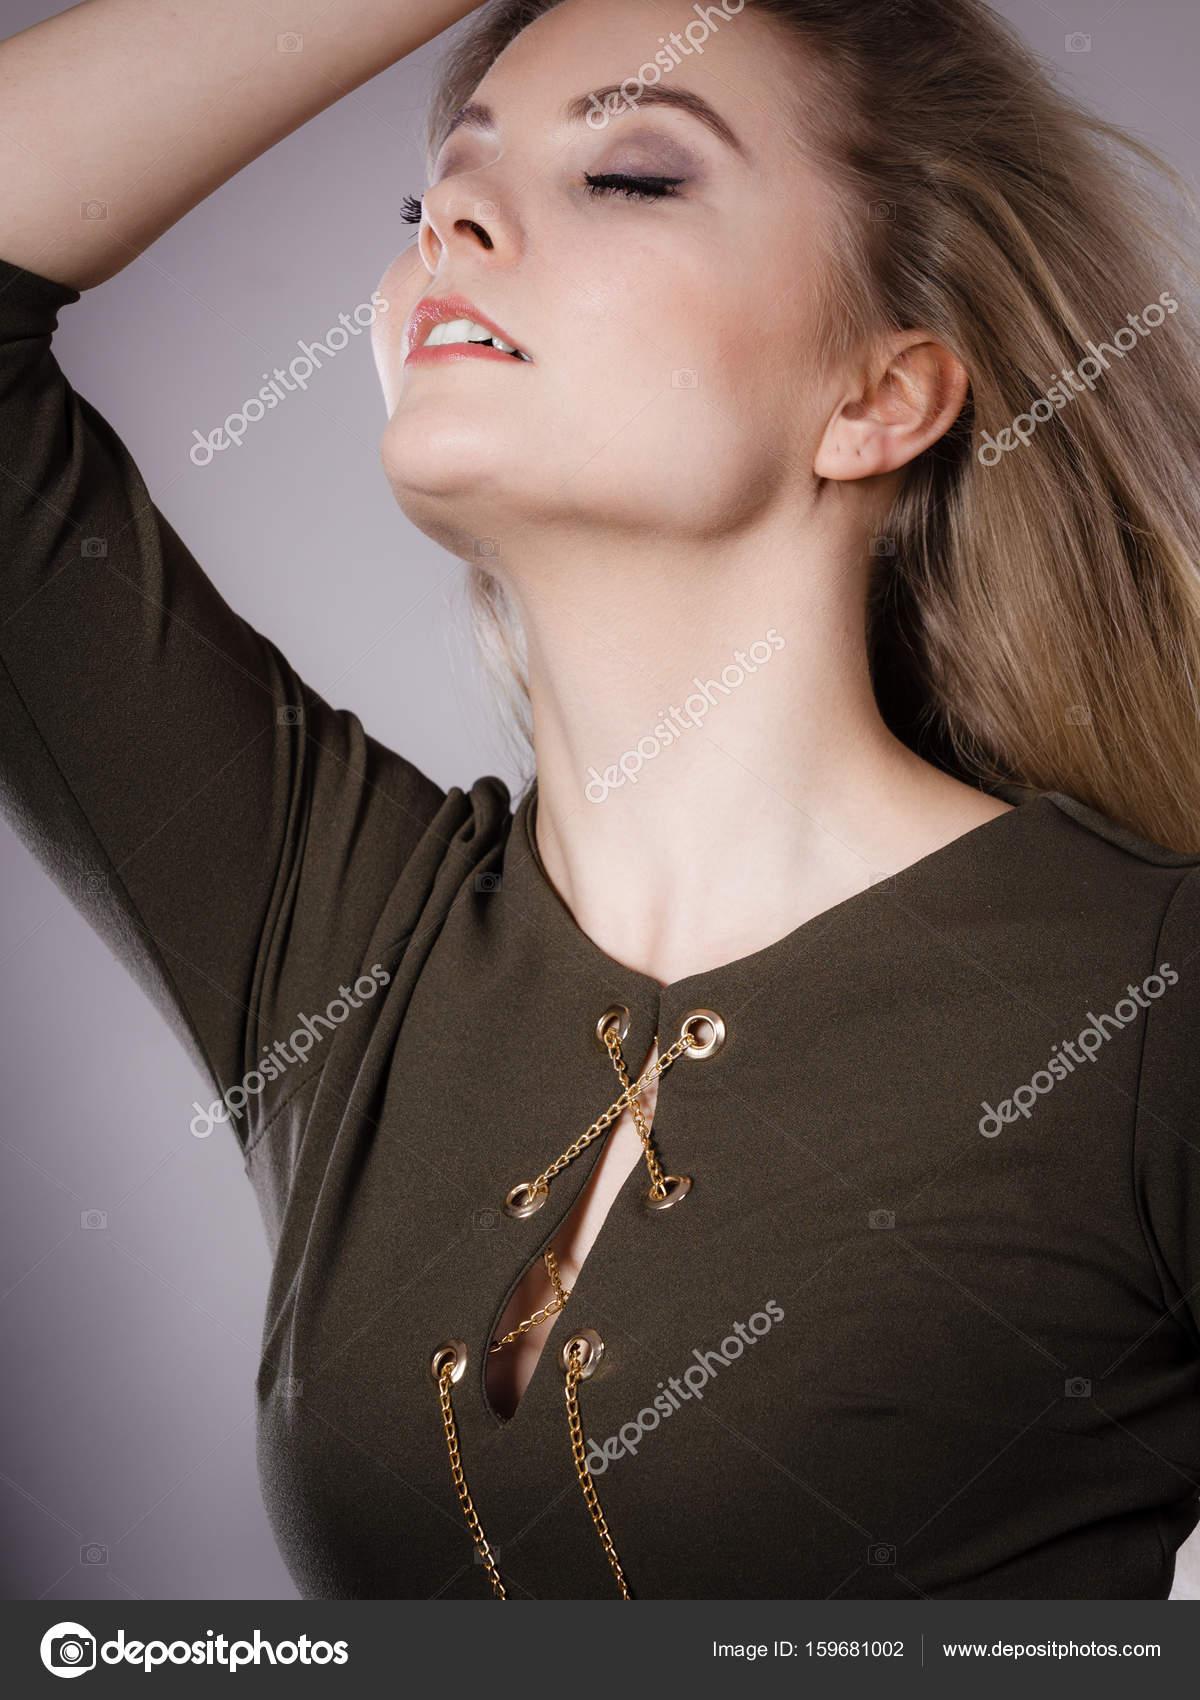 f01cec29fb4b Ελκυστική ξανθιά γυναίκα που φοράει στενό πράσινο χακί φόρεμα ...